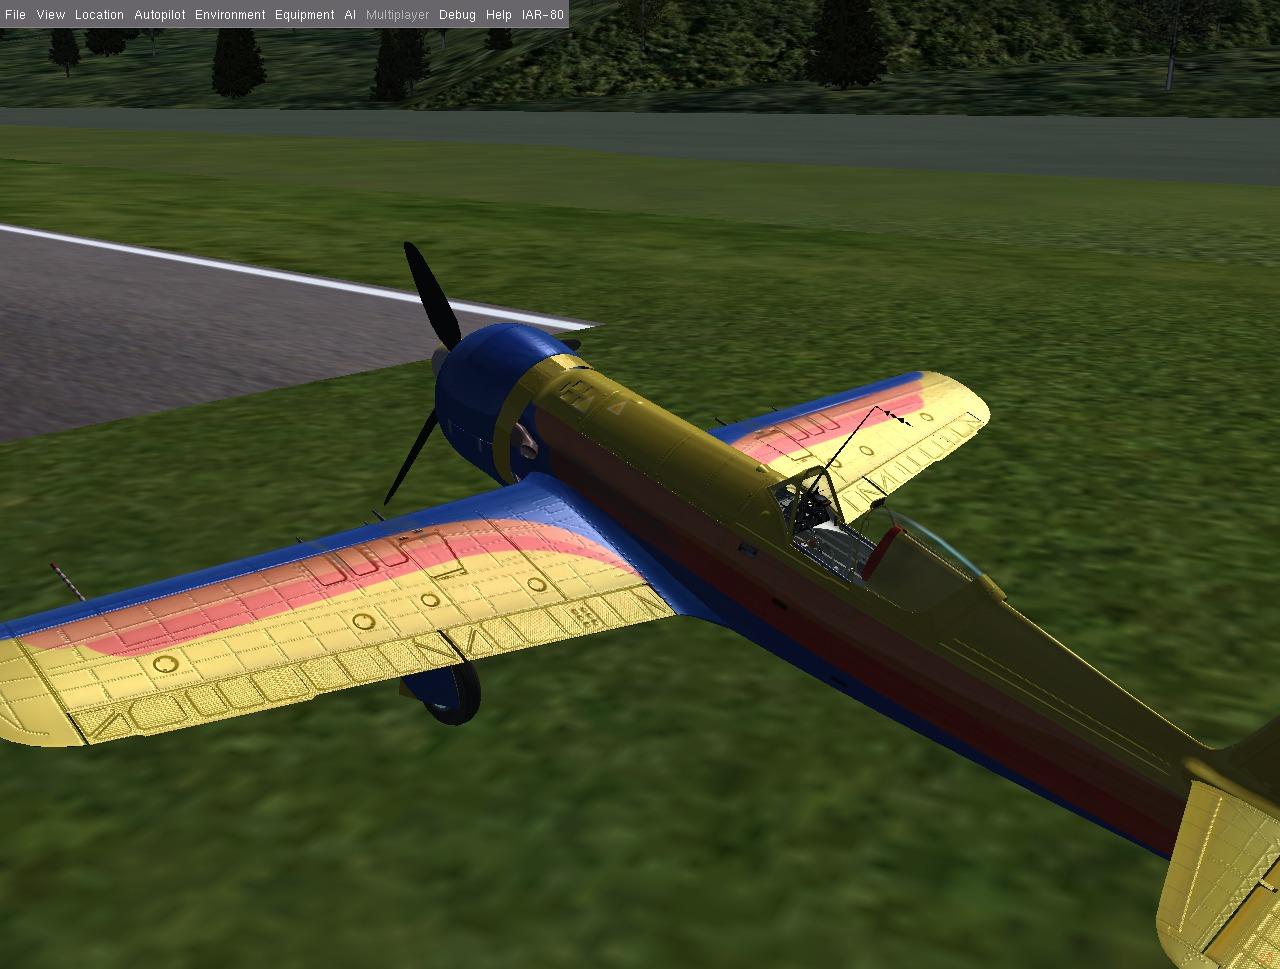 a quoi ça ressemble un avion qui utilise les ubershader ?? IAR80-ubershader